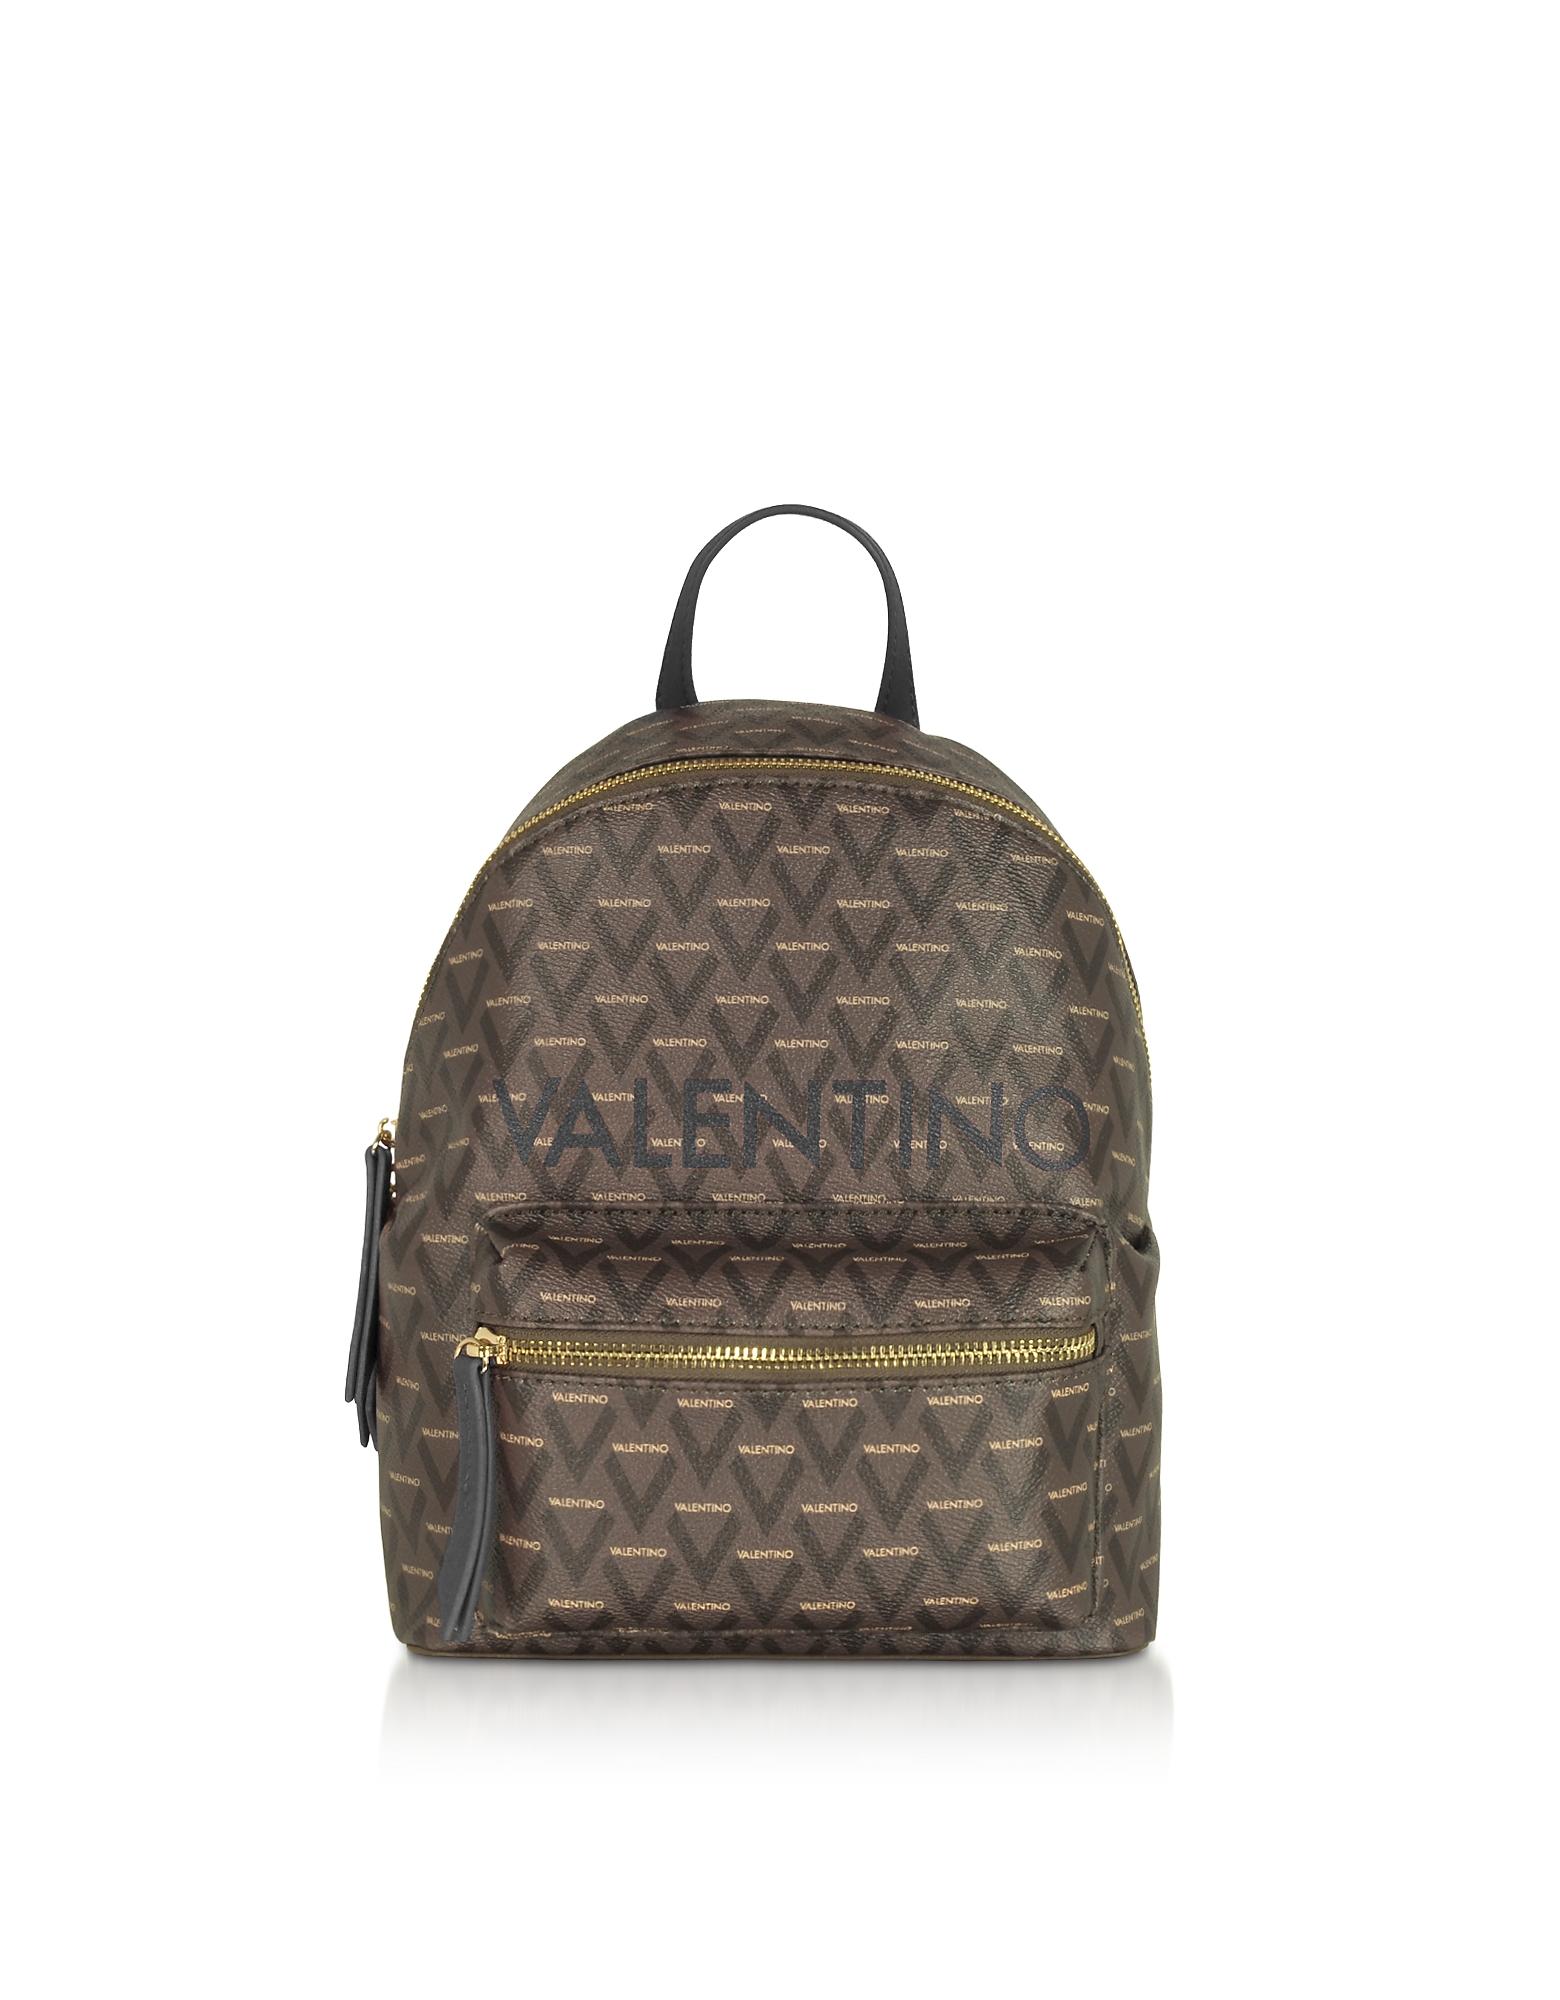 Valentino by Mario Valentino Designer Handbags, Liuto Signature Eco Leather Backpack